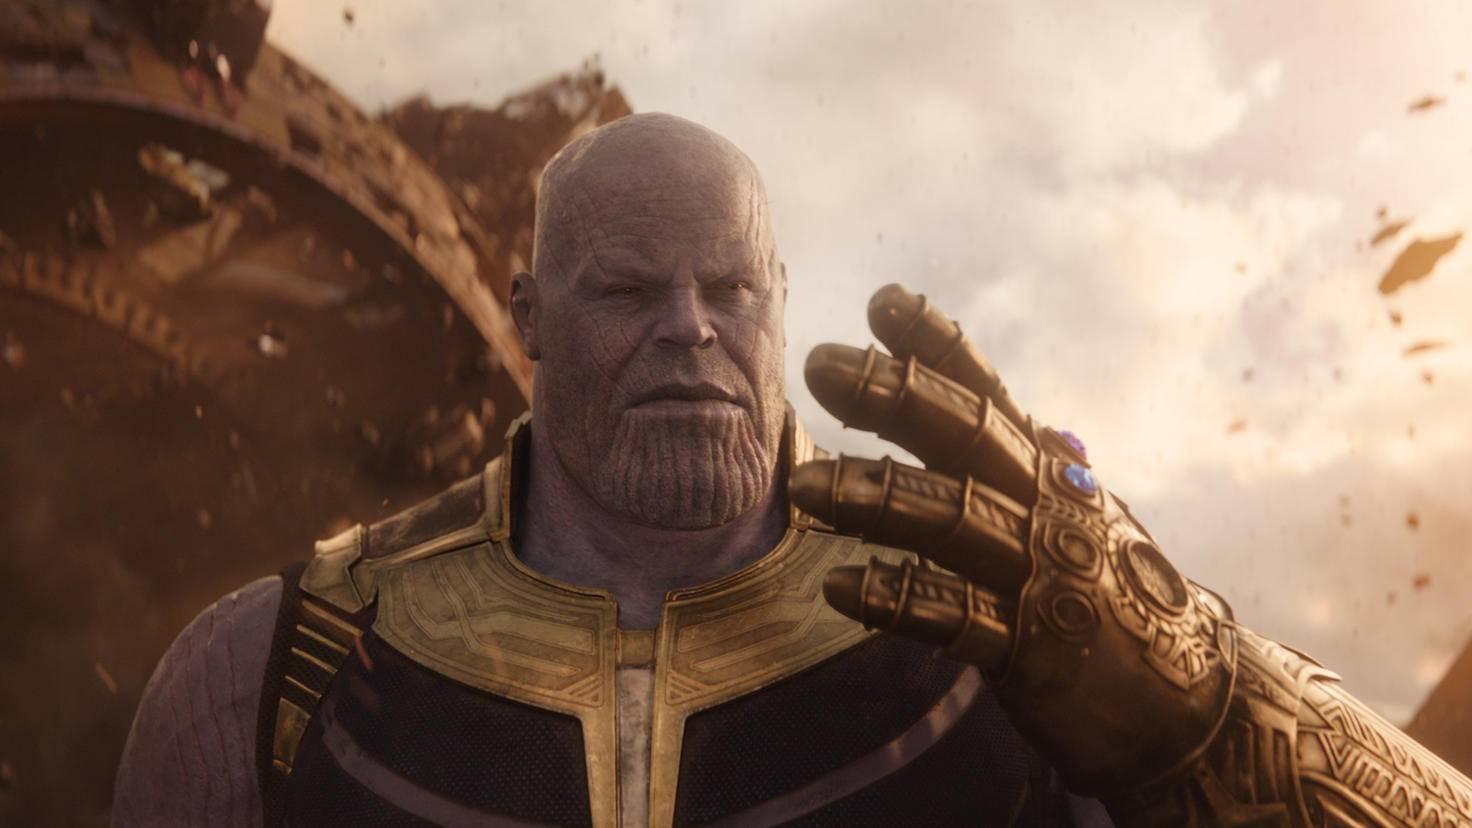 Thanos mit Infinity Gauntlet in Avengers: Infinity War